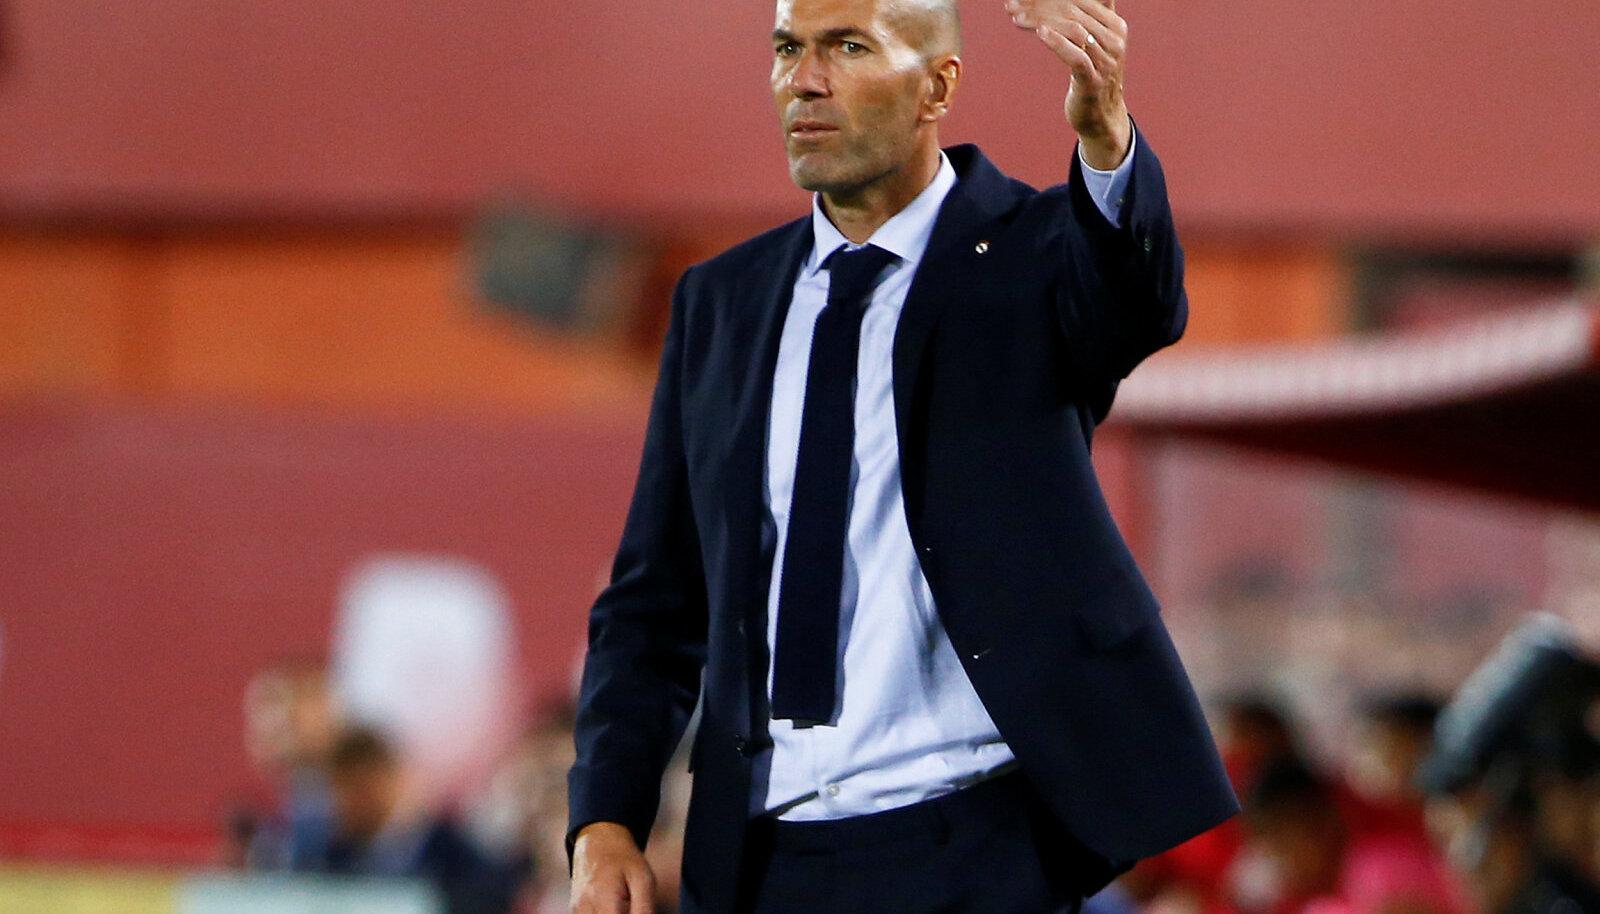 Madridi Reali peatreener Zinedine Zidane